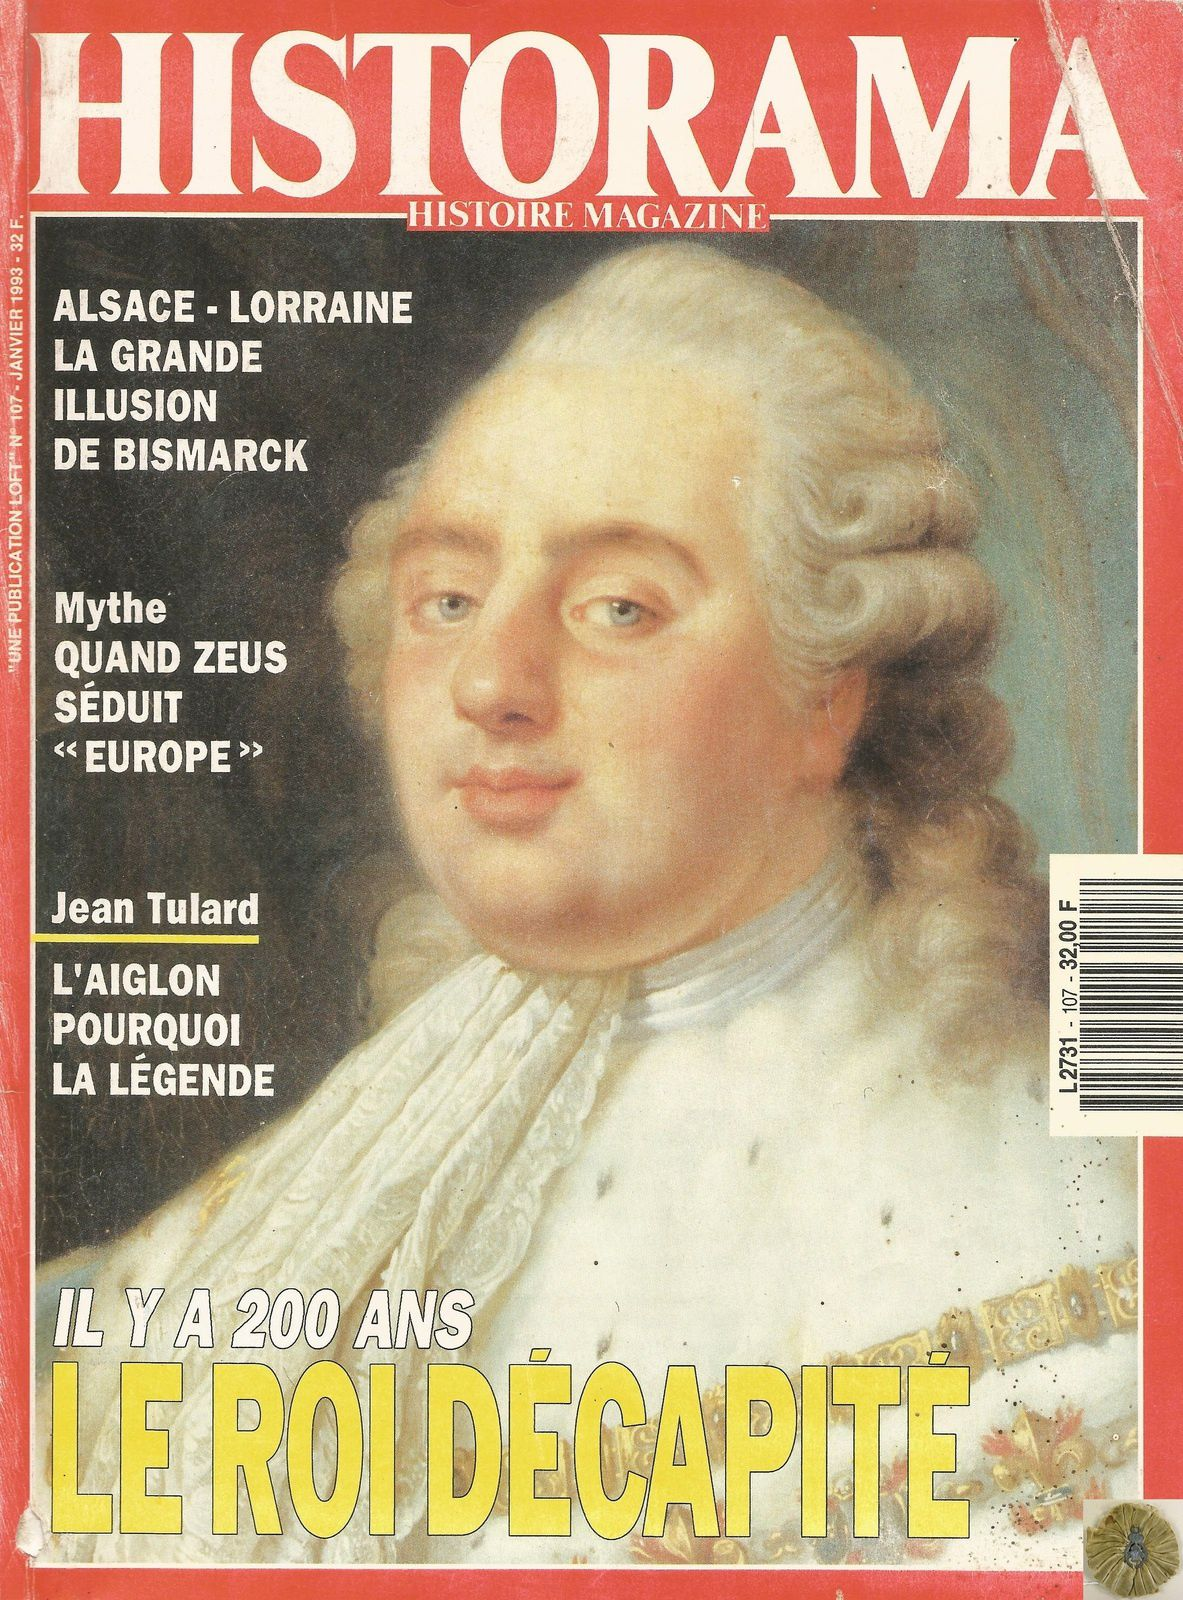 HISTORAMA107 - LOUIS XVI EN COSTUME DE SACRE, VERSAILLES